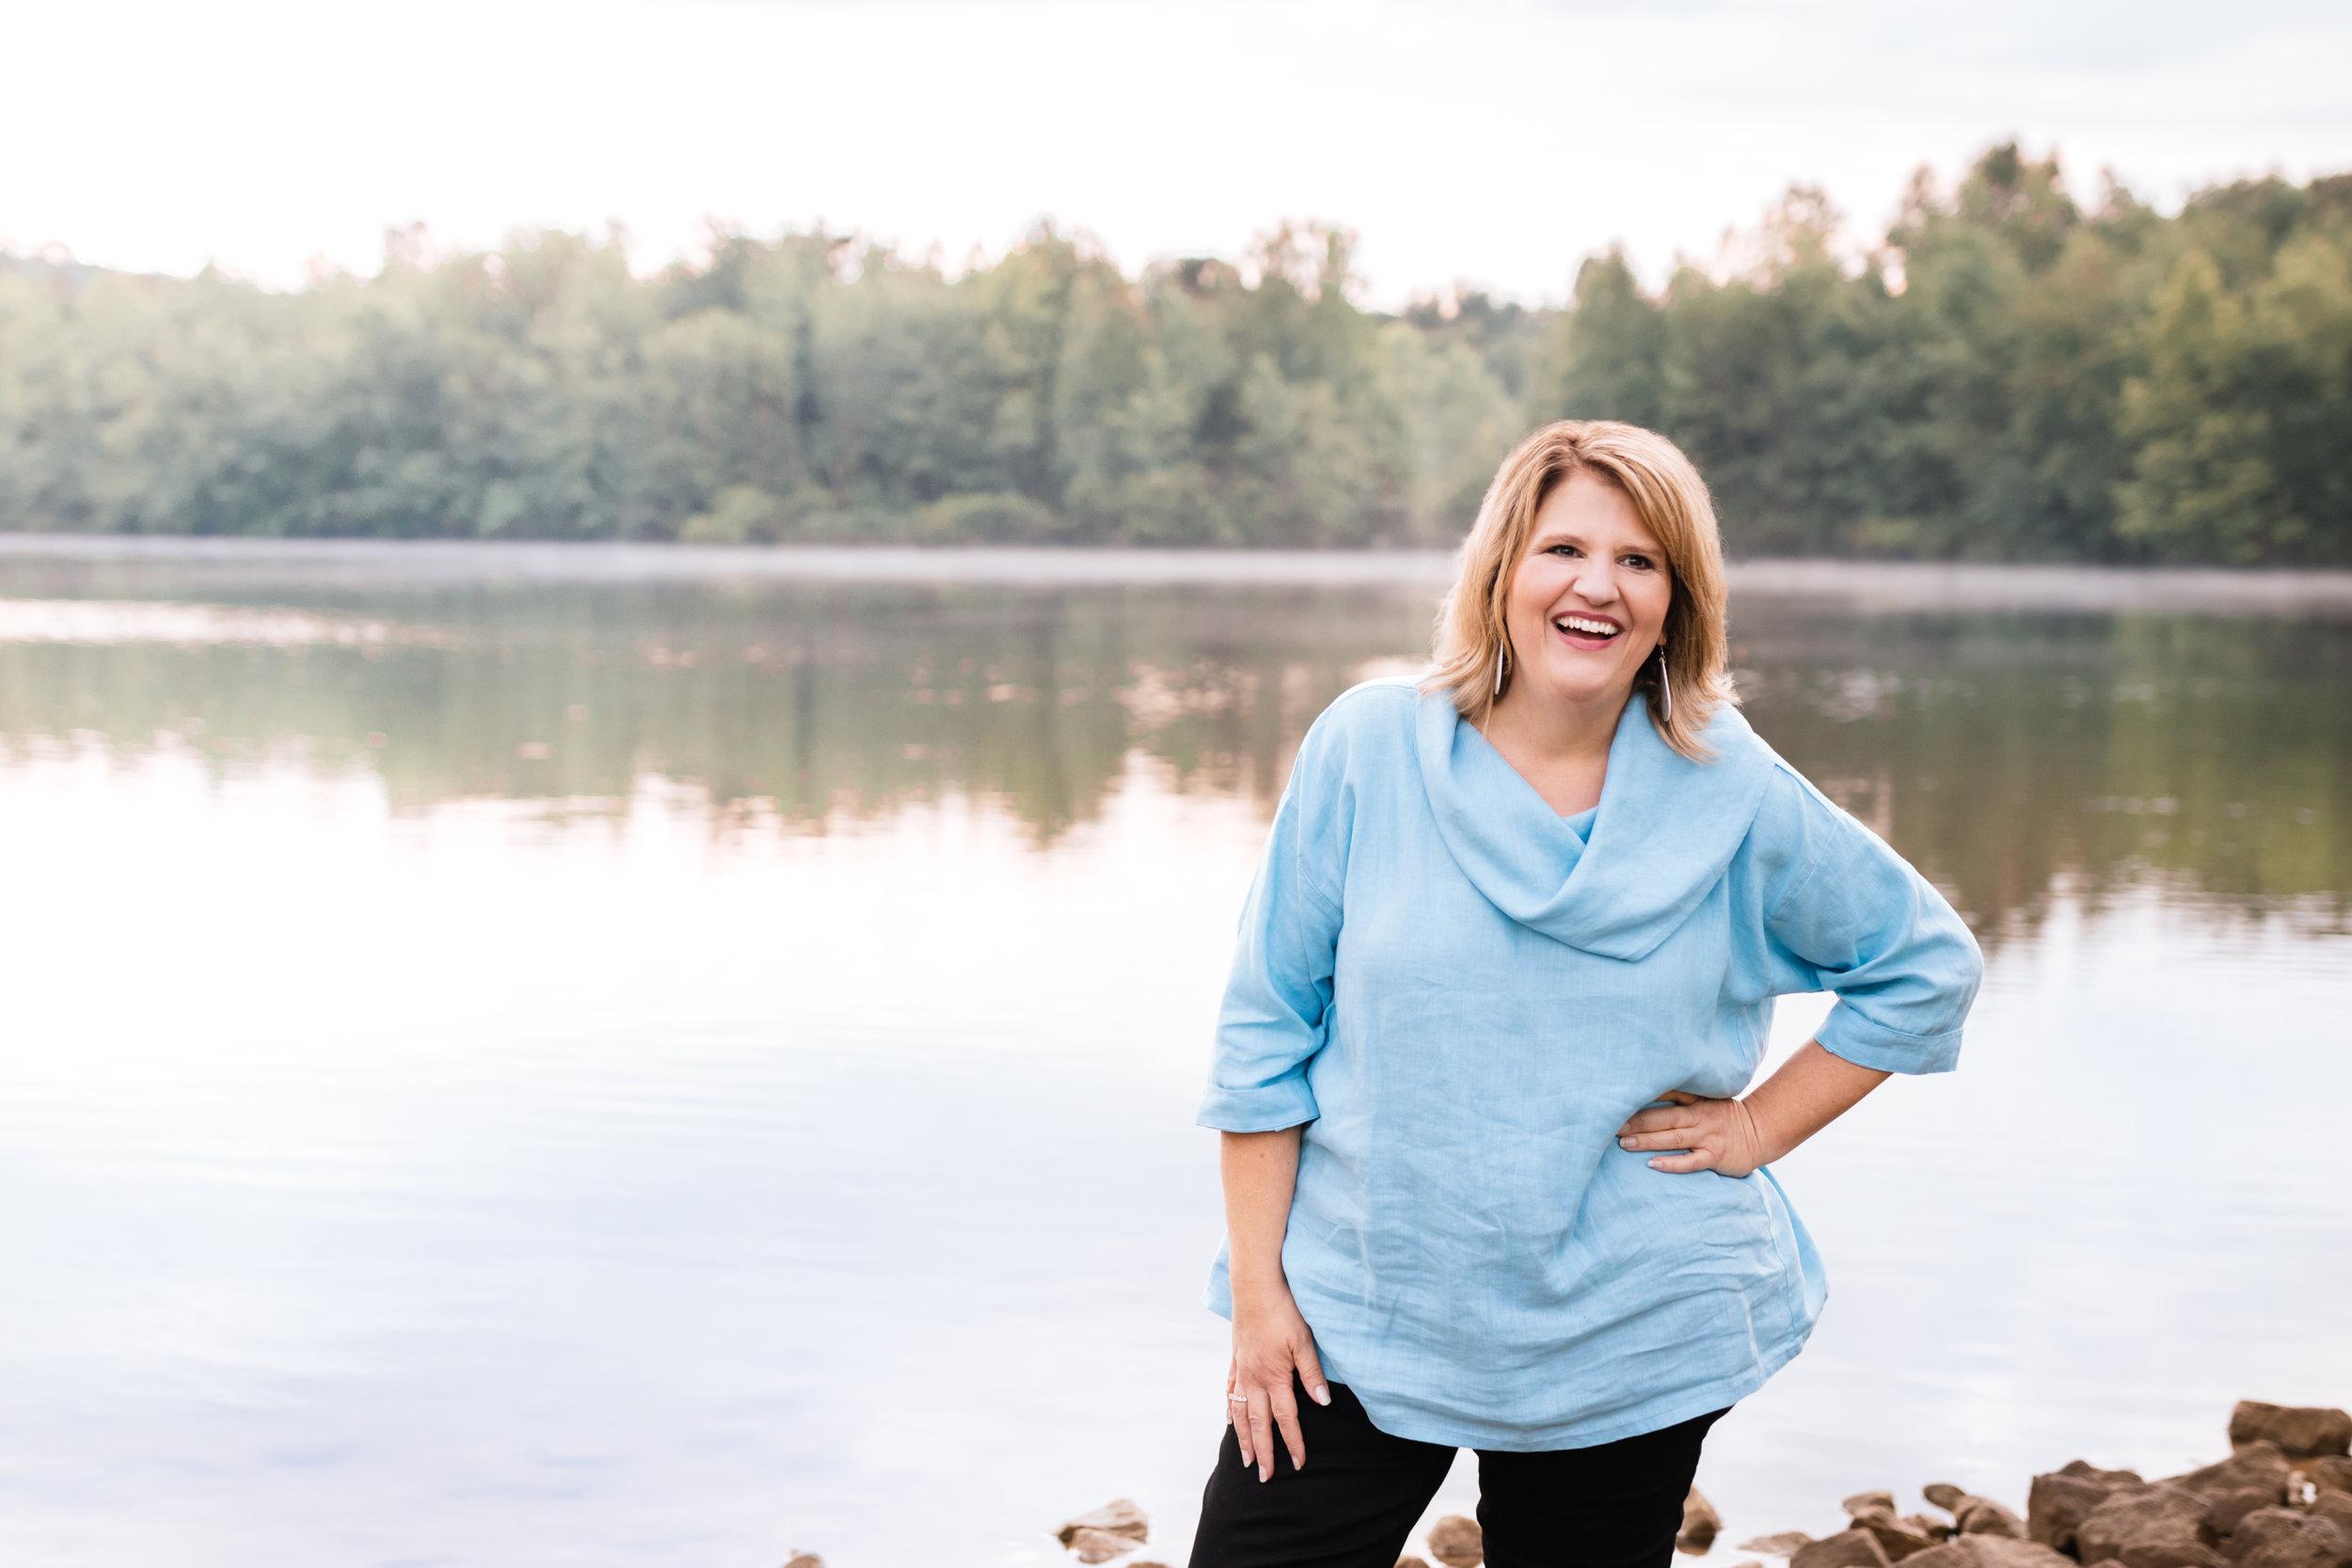 Becky Davidson Redefine This Life